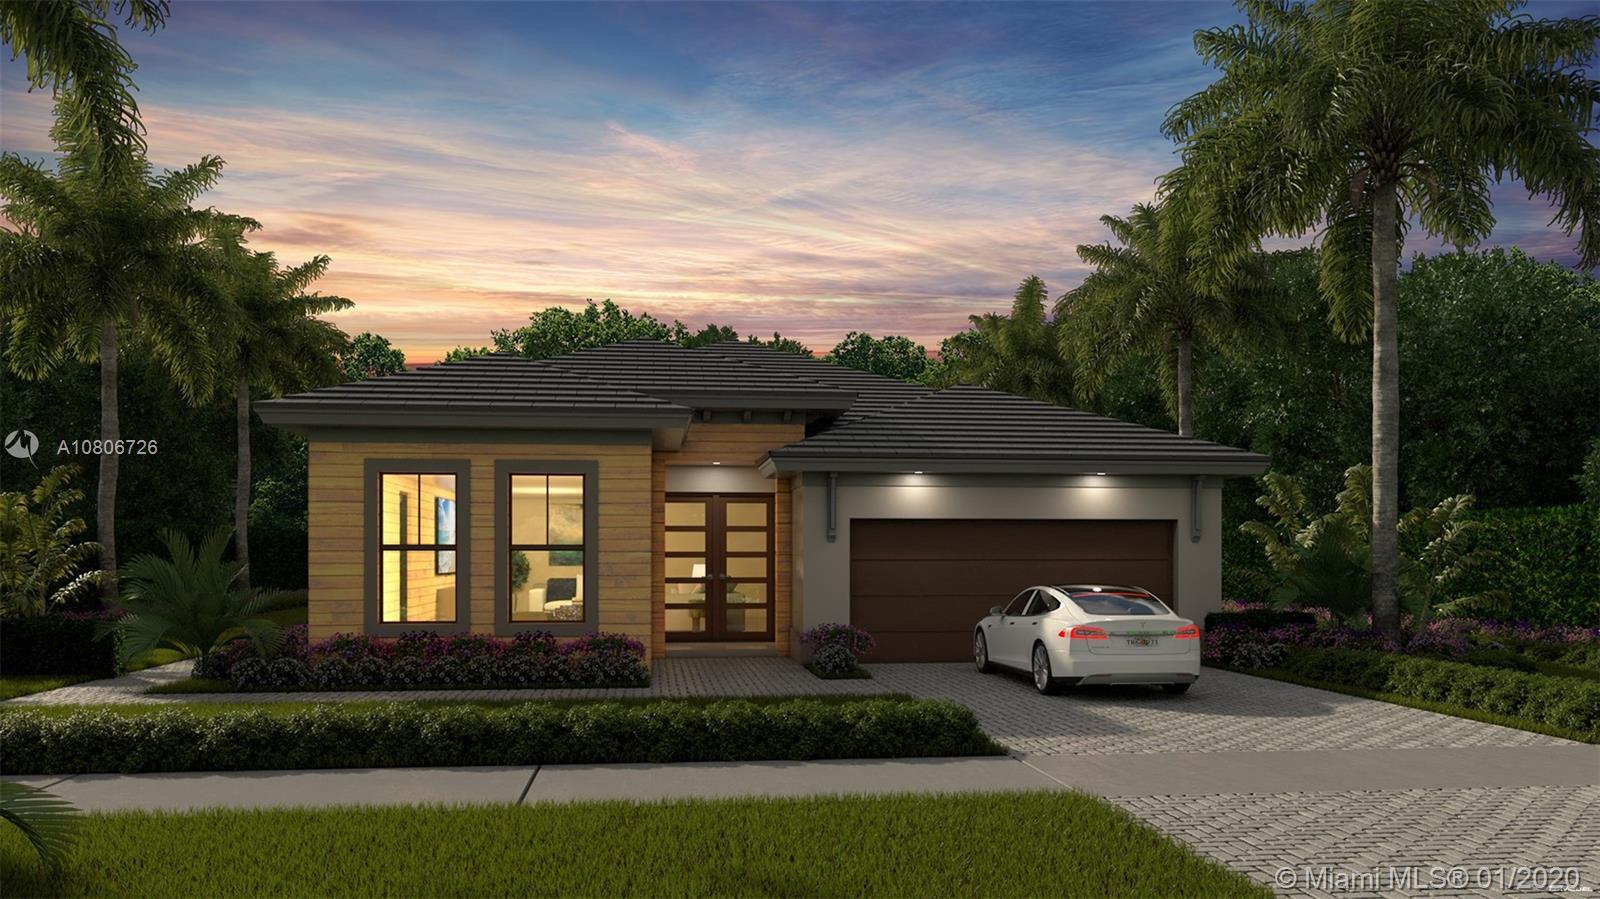 29132 SW 165 TER, Homestead, FL 33030 - Homestead, FL real estate listing